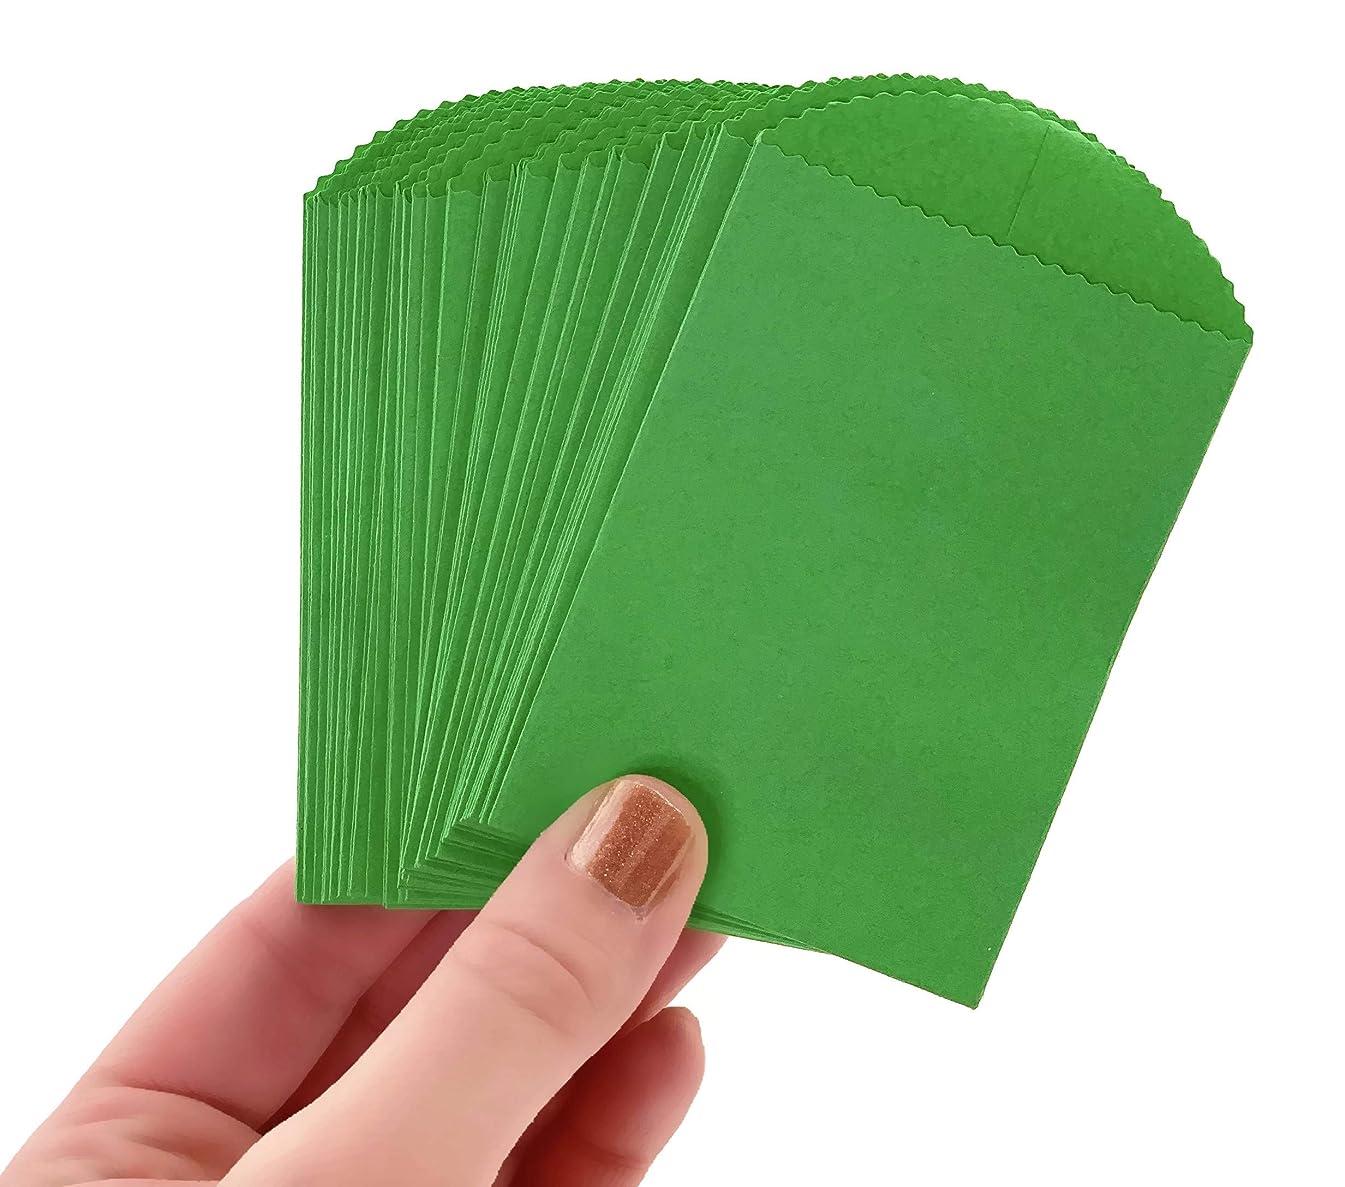 50 Mini Green Paper Bags - 4